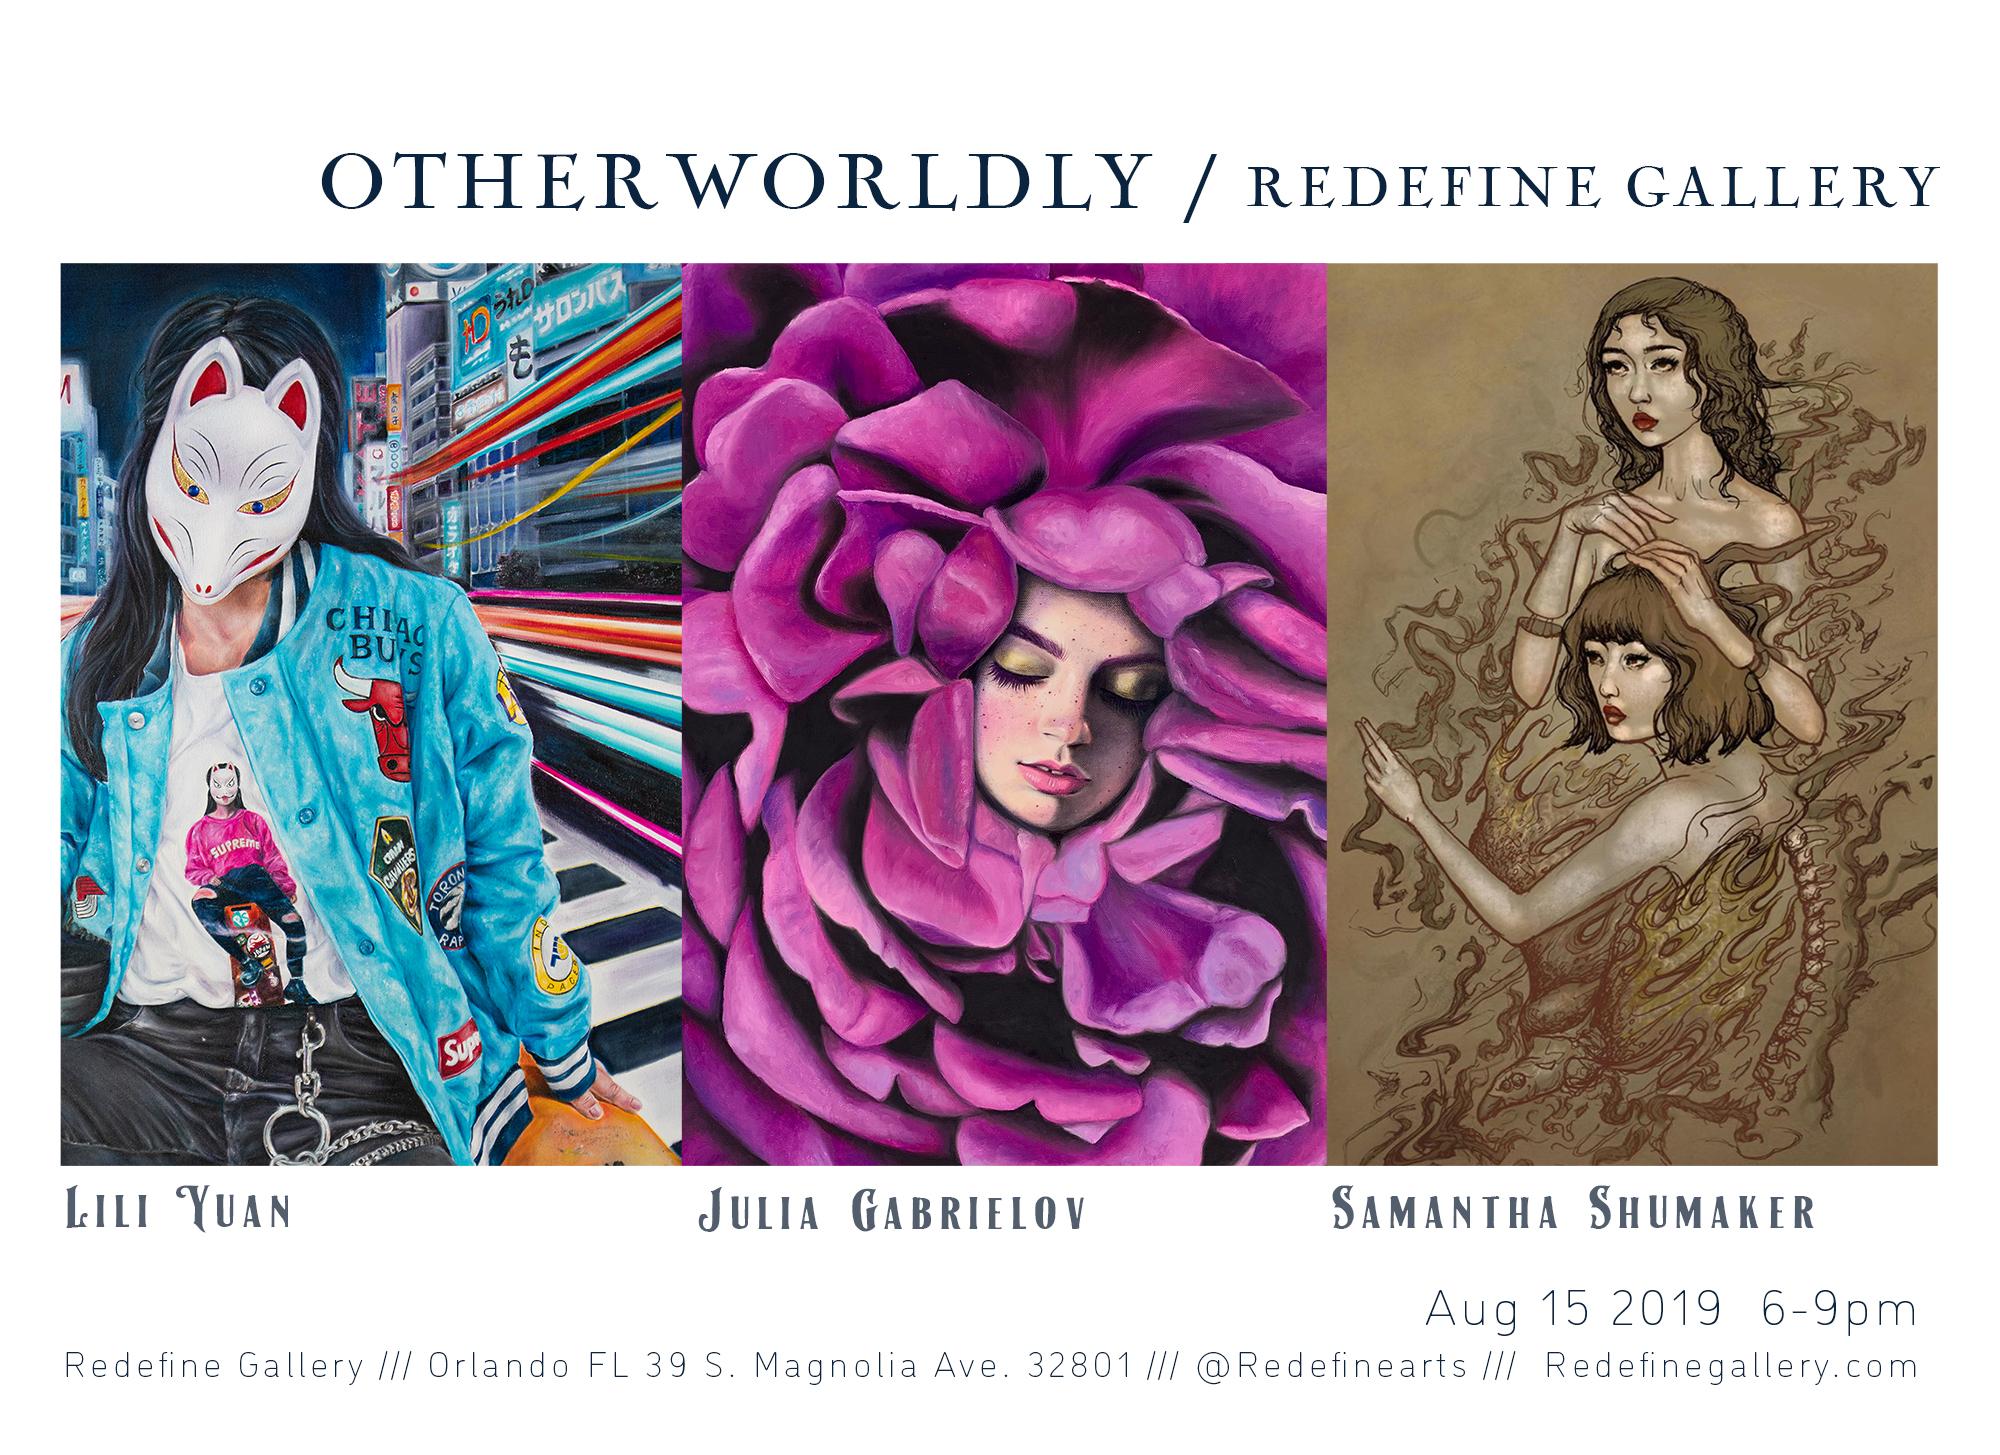 OTHERWORLDLY///Lili Yuan / Julia Gabrielov / Samantha Shumaker - Redefine Gallery